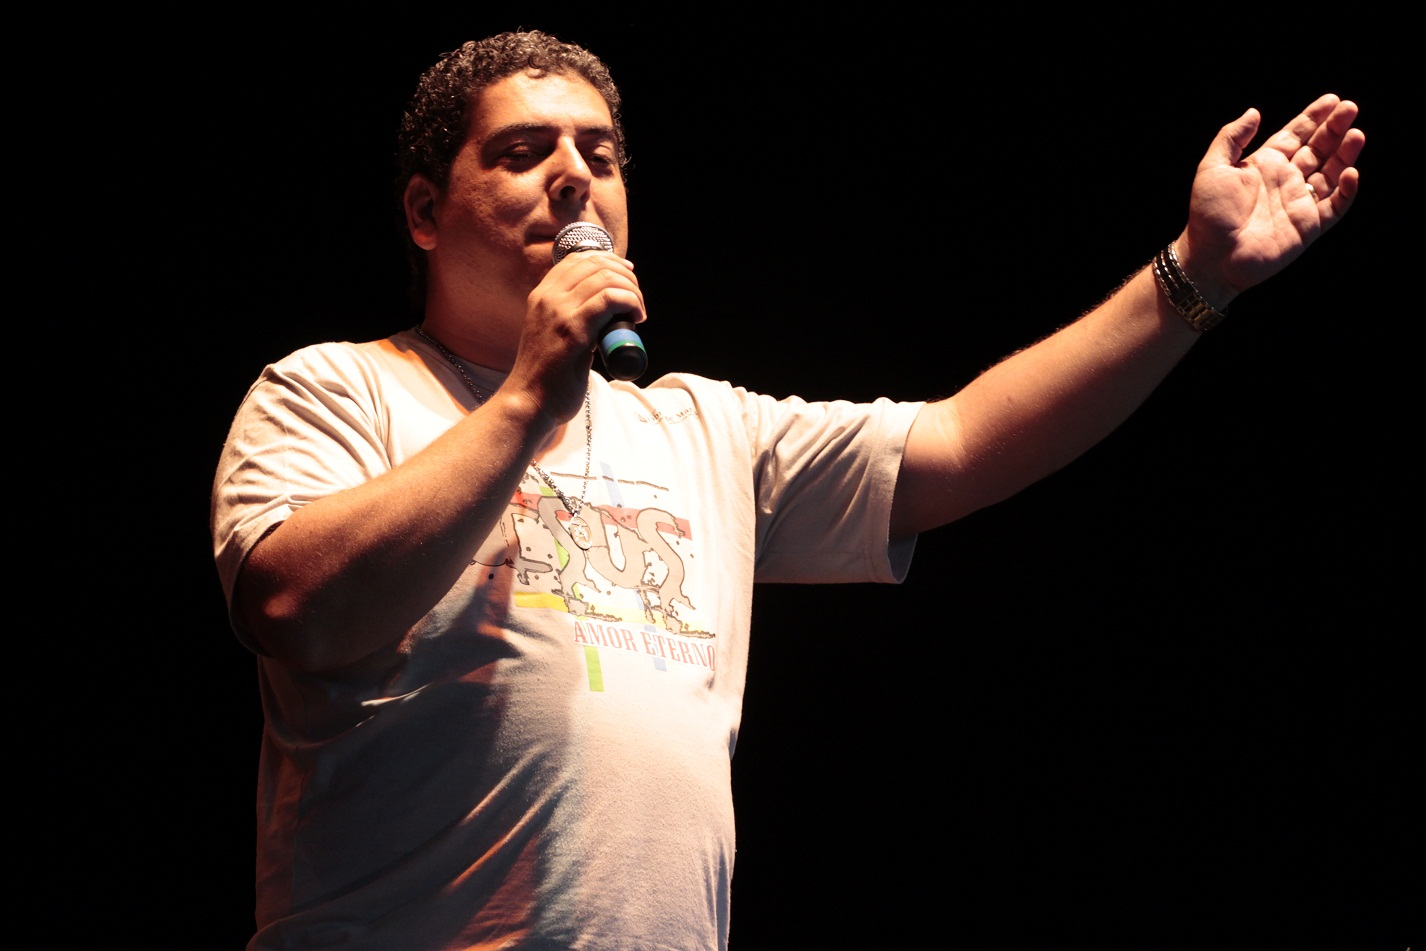 Enchei Vos Do Espírito Santo De: RCC / Olinda E Recife: ENCHEI-VOS DO ESPÍRITO SANTO DE